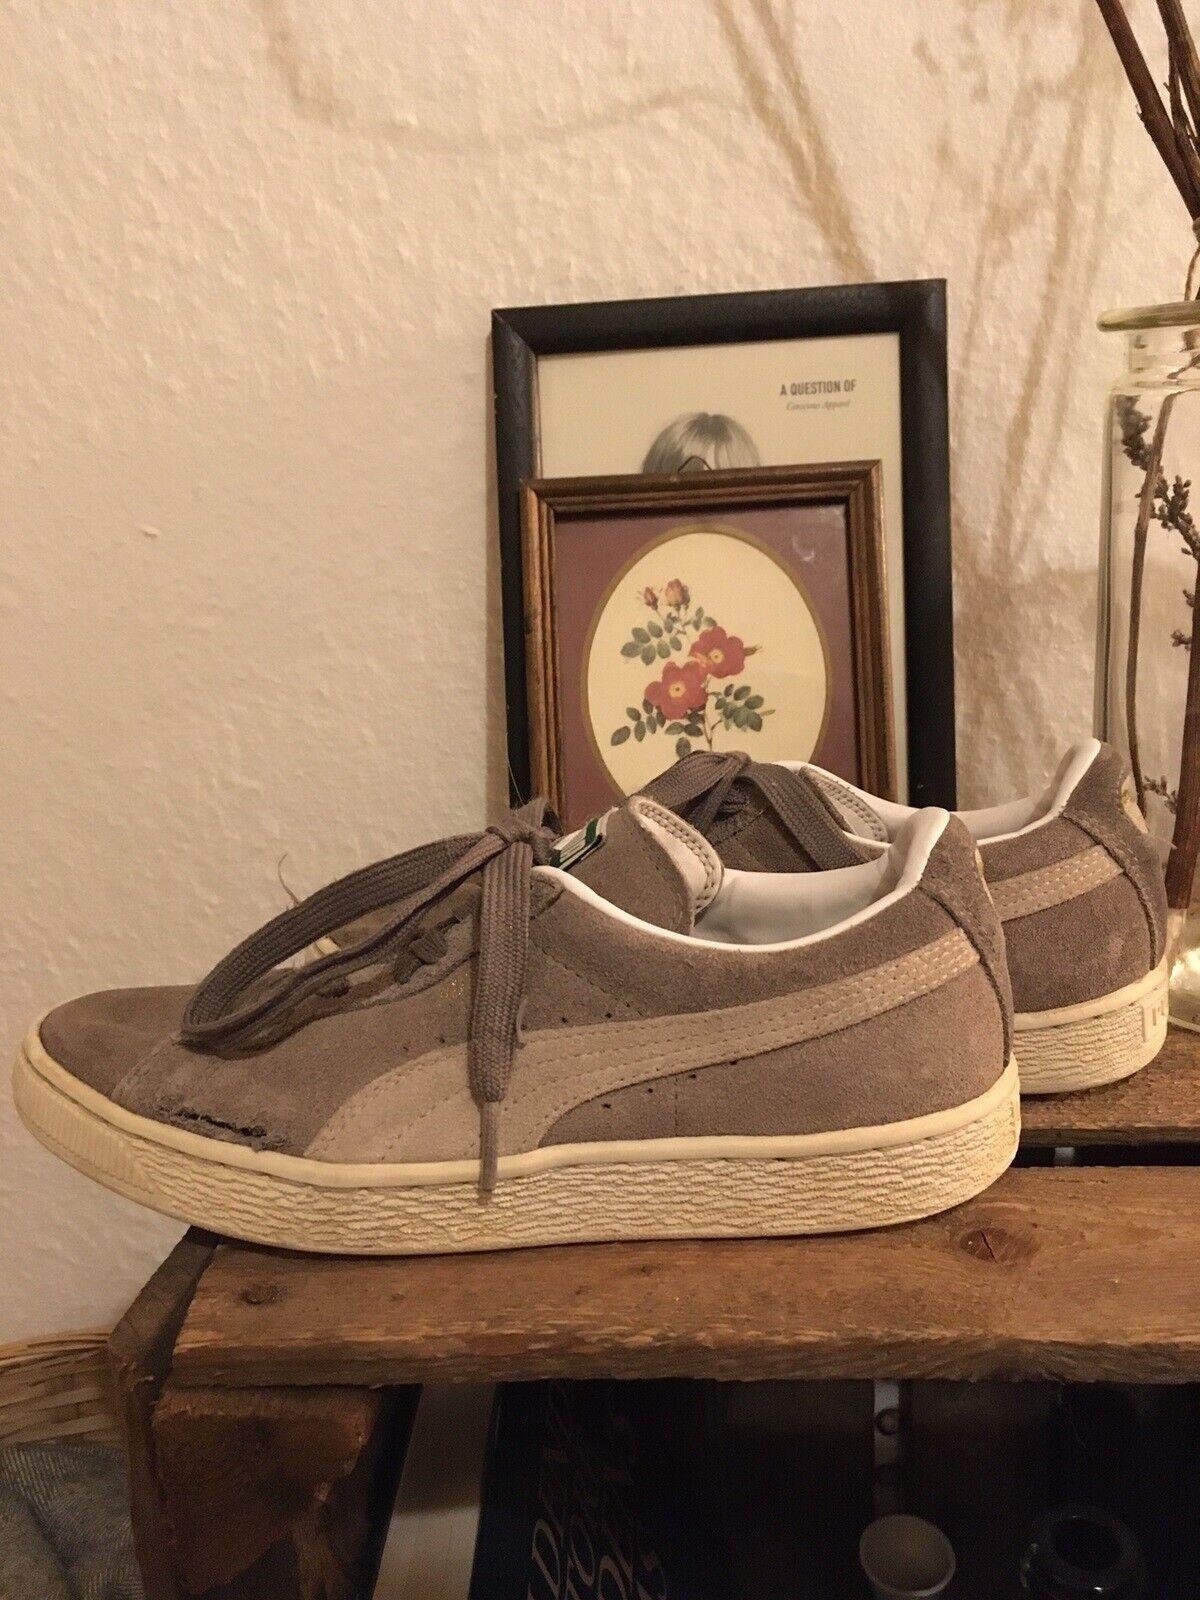 Sneakers, str. 38, Puma, Slidt